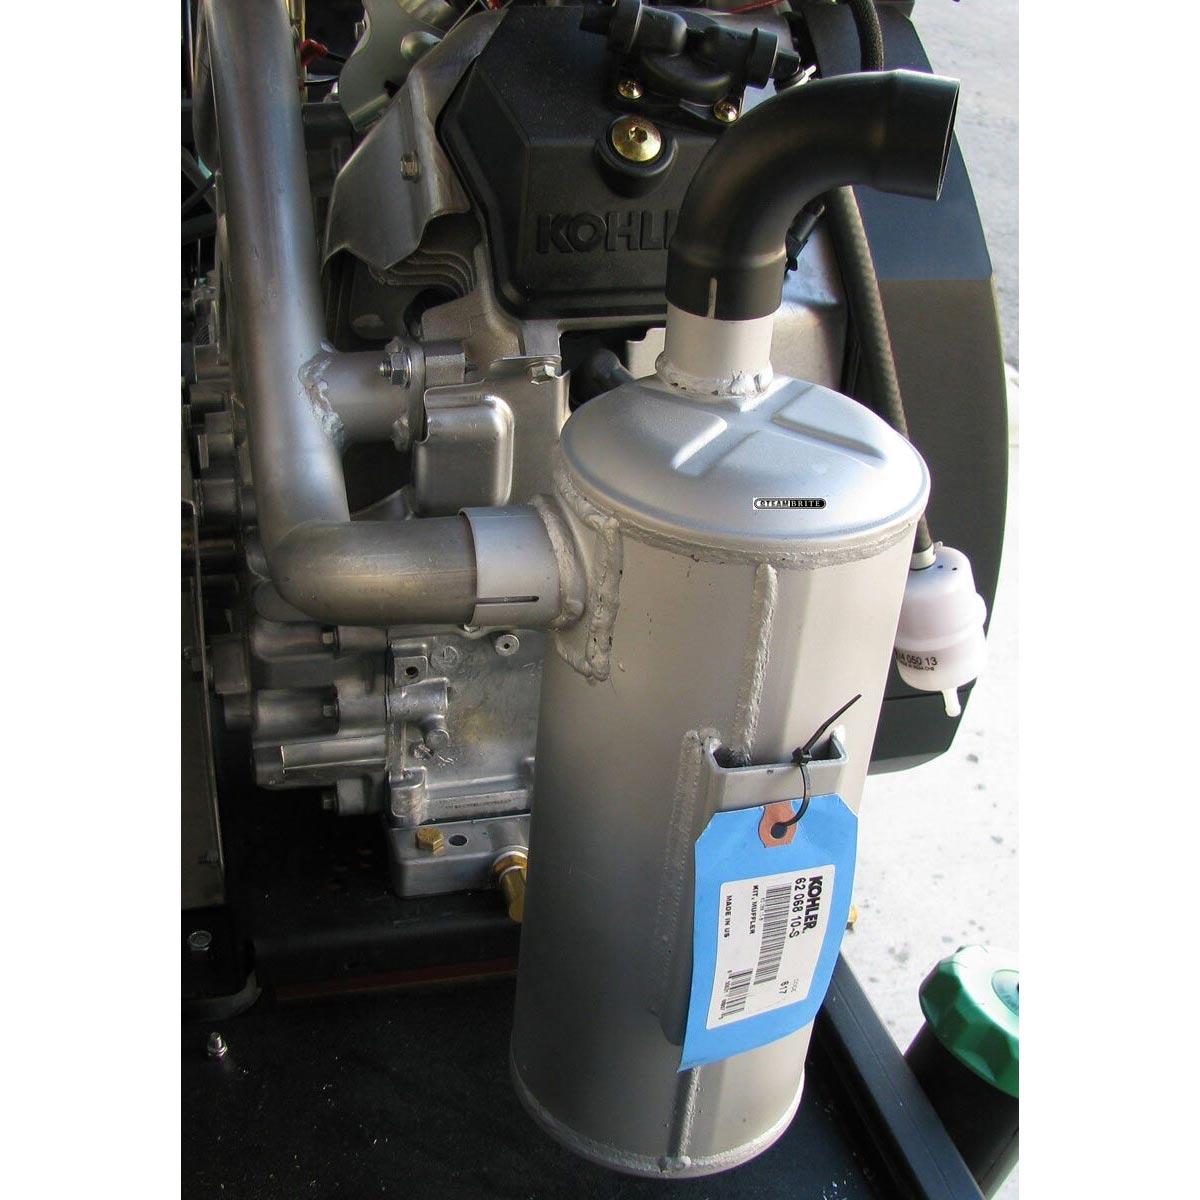 Steam Brite Carpet Cleaning Machines Truck Mount Kohler Ch680 Engine Wiring Diagram Muffler Kit For Ch940 Through Ch1000 Series 6206810 S 62 068 10